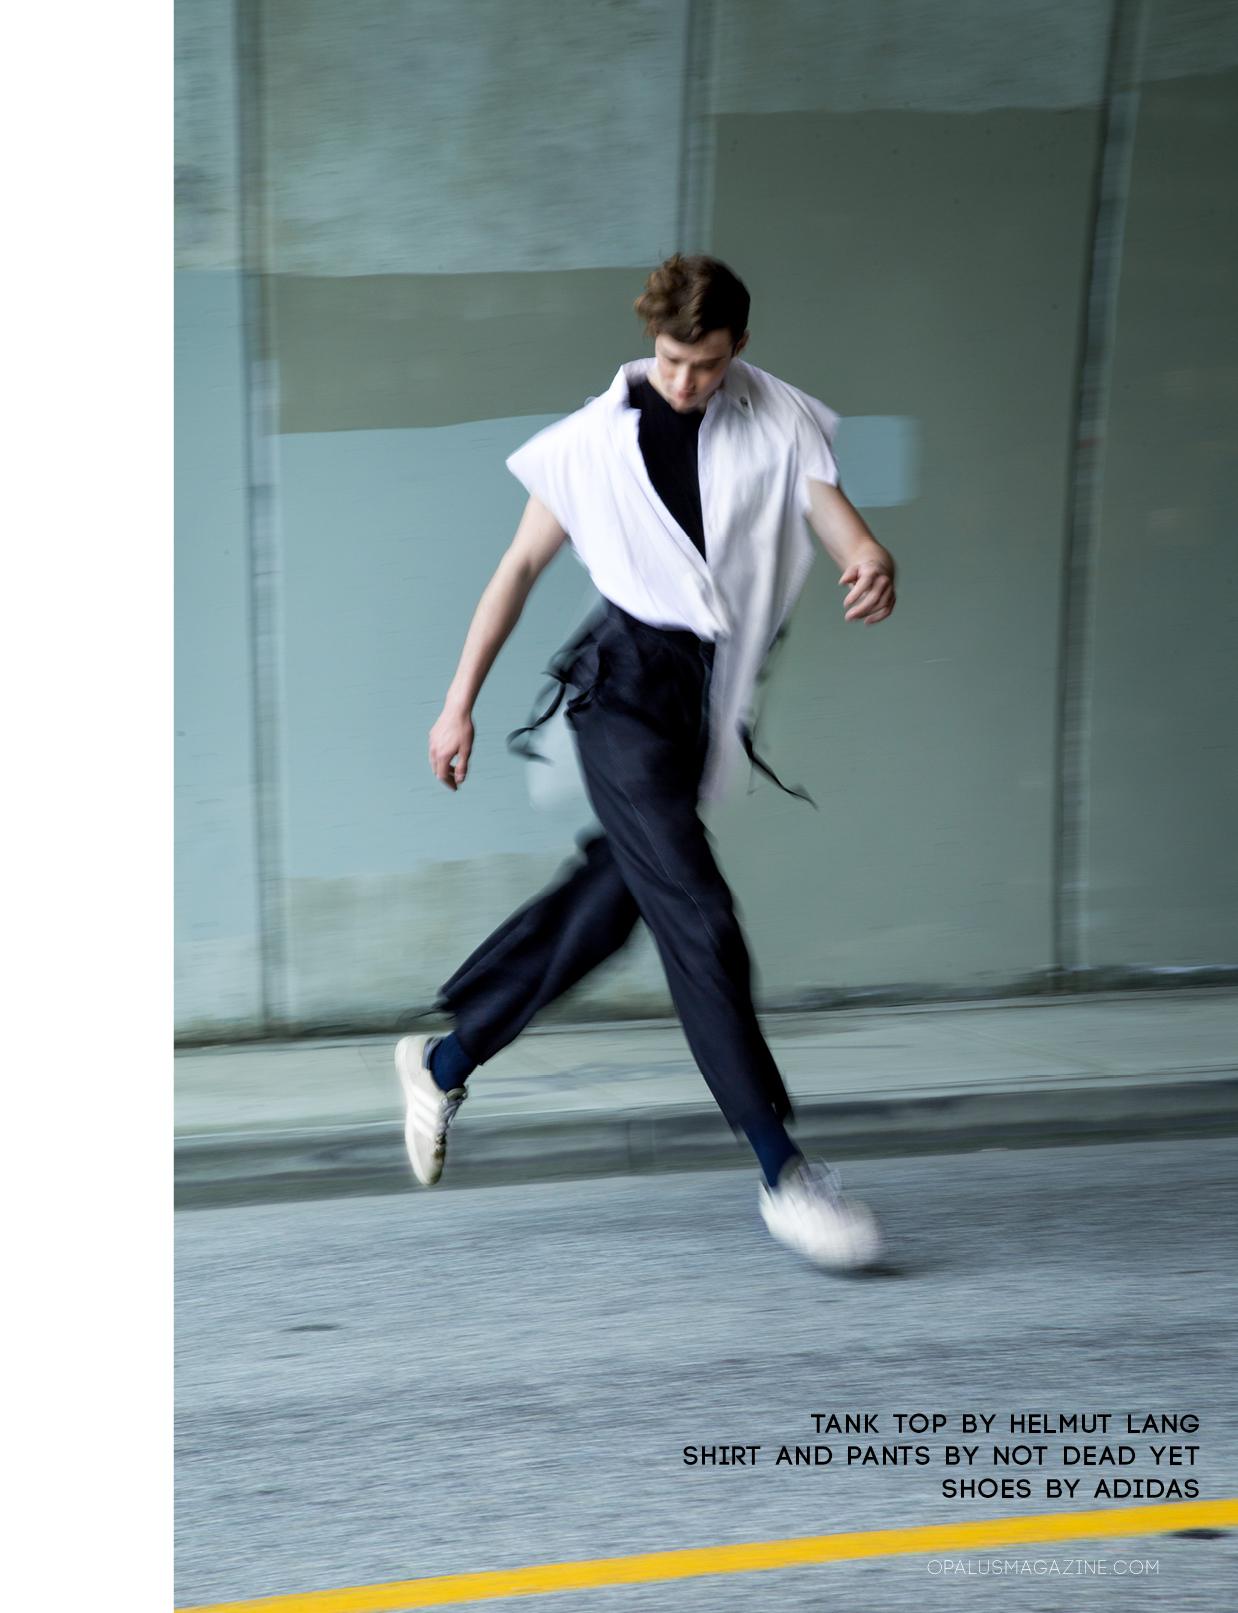 DancingIntotheVoid_OPALUS_Magazine.jpg